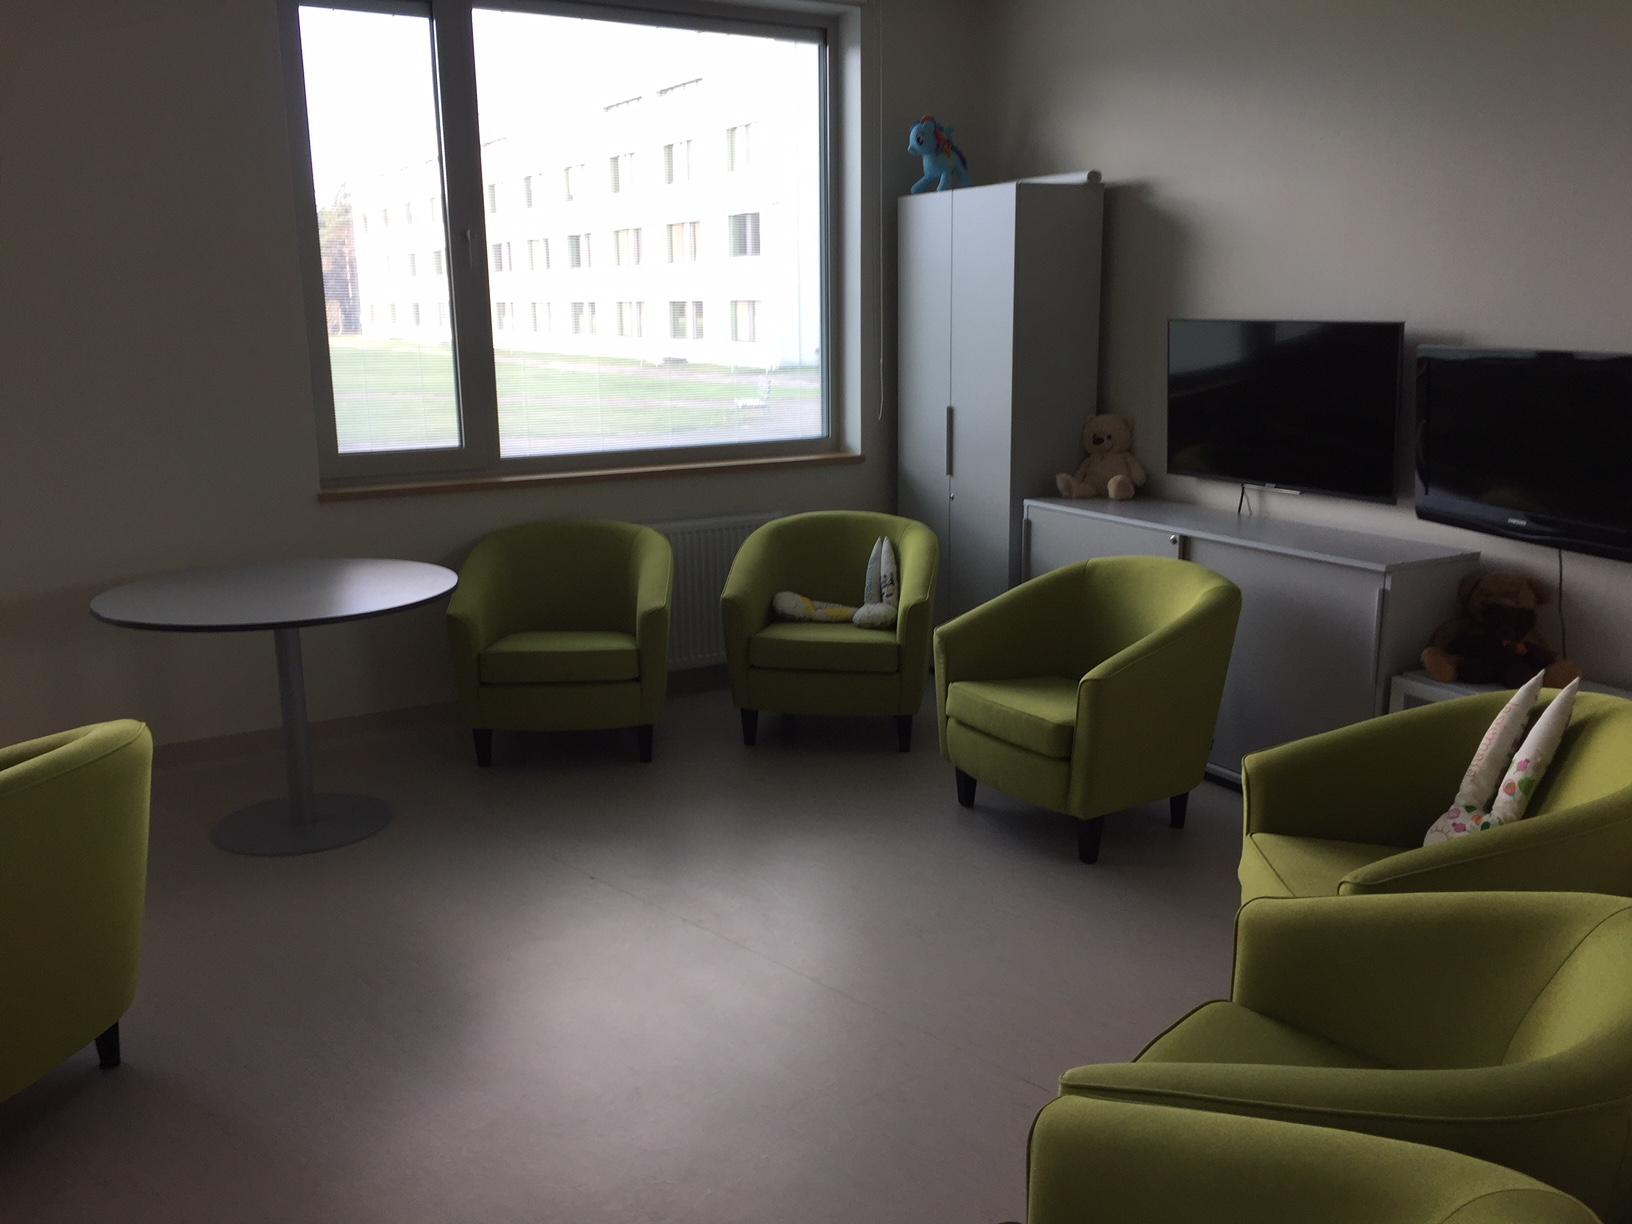 Estonia 6 - hospital.jpg